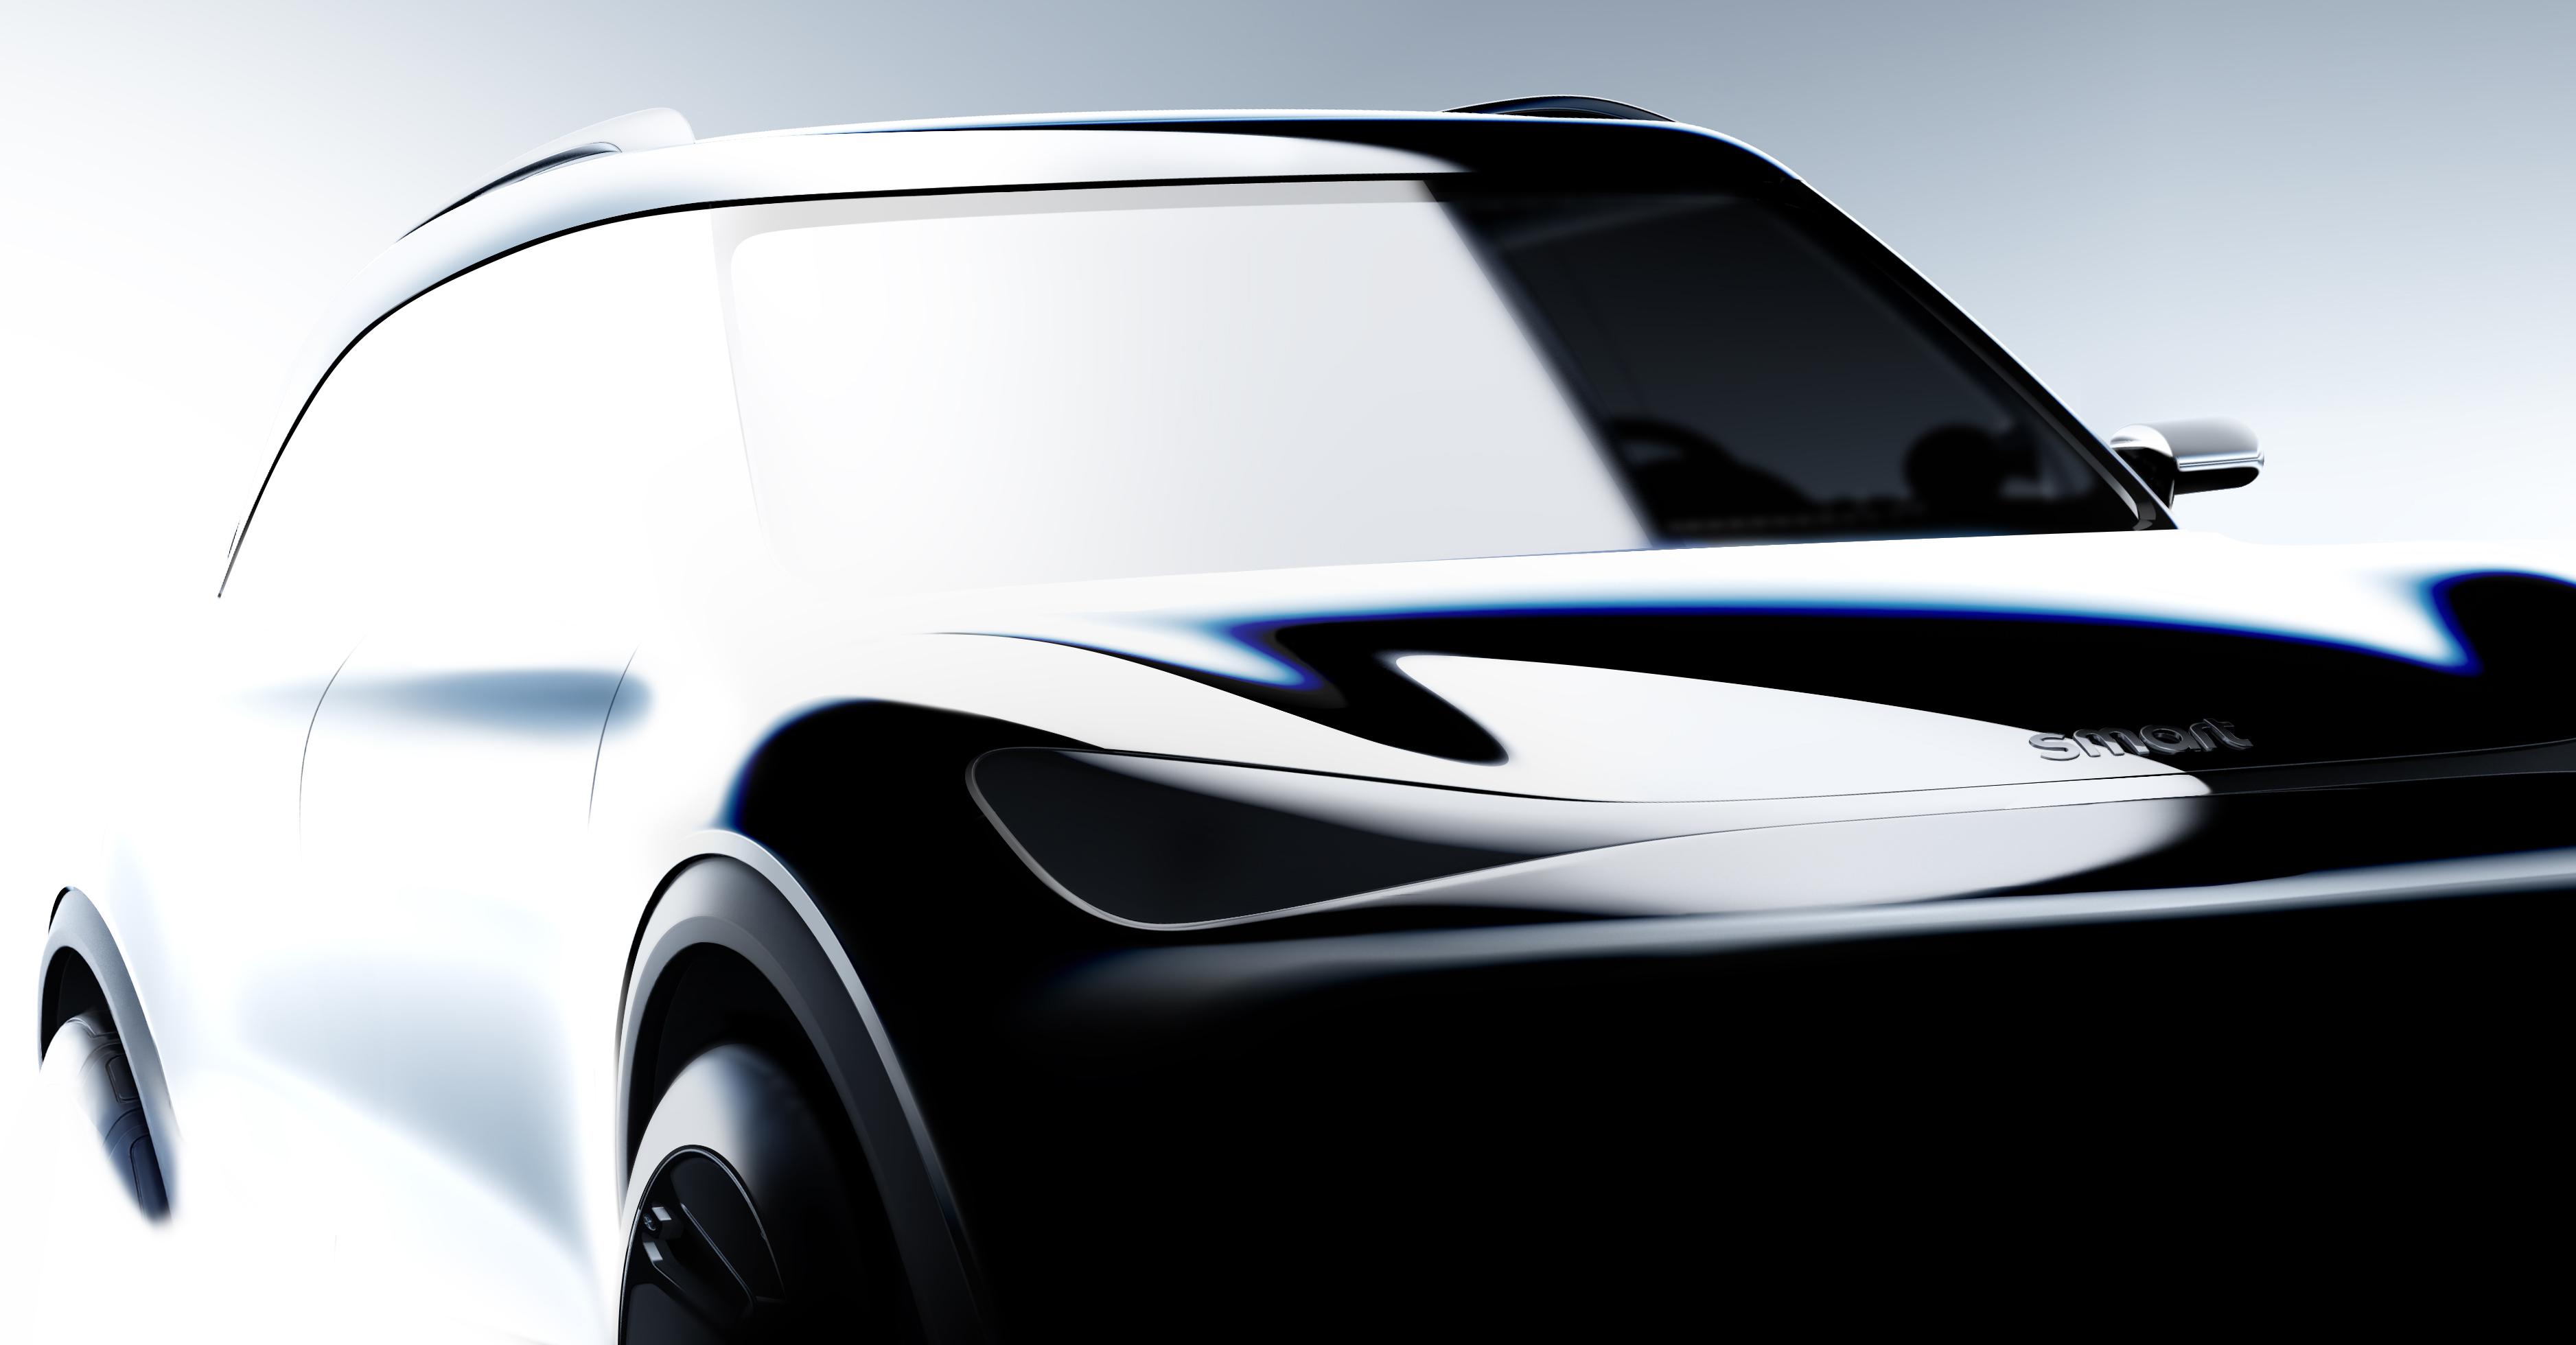 9月发布/2022年上市 smart纯电动SUV渲染图曝光